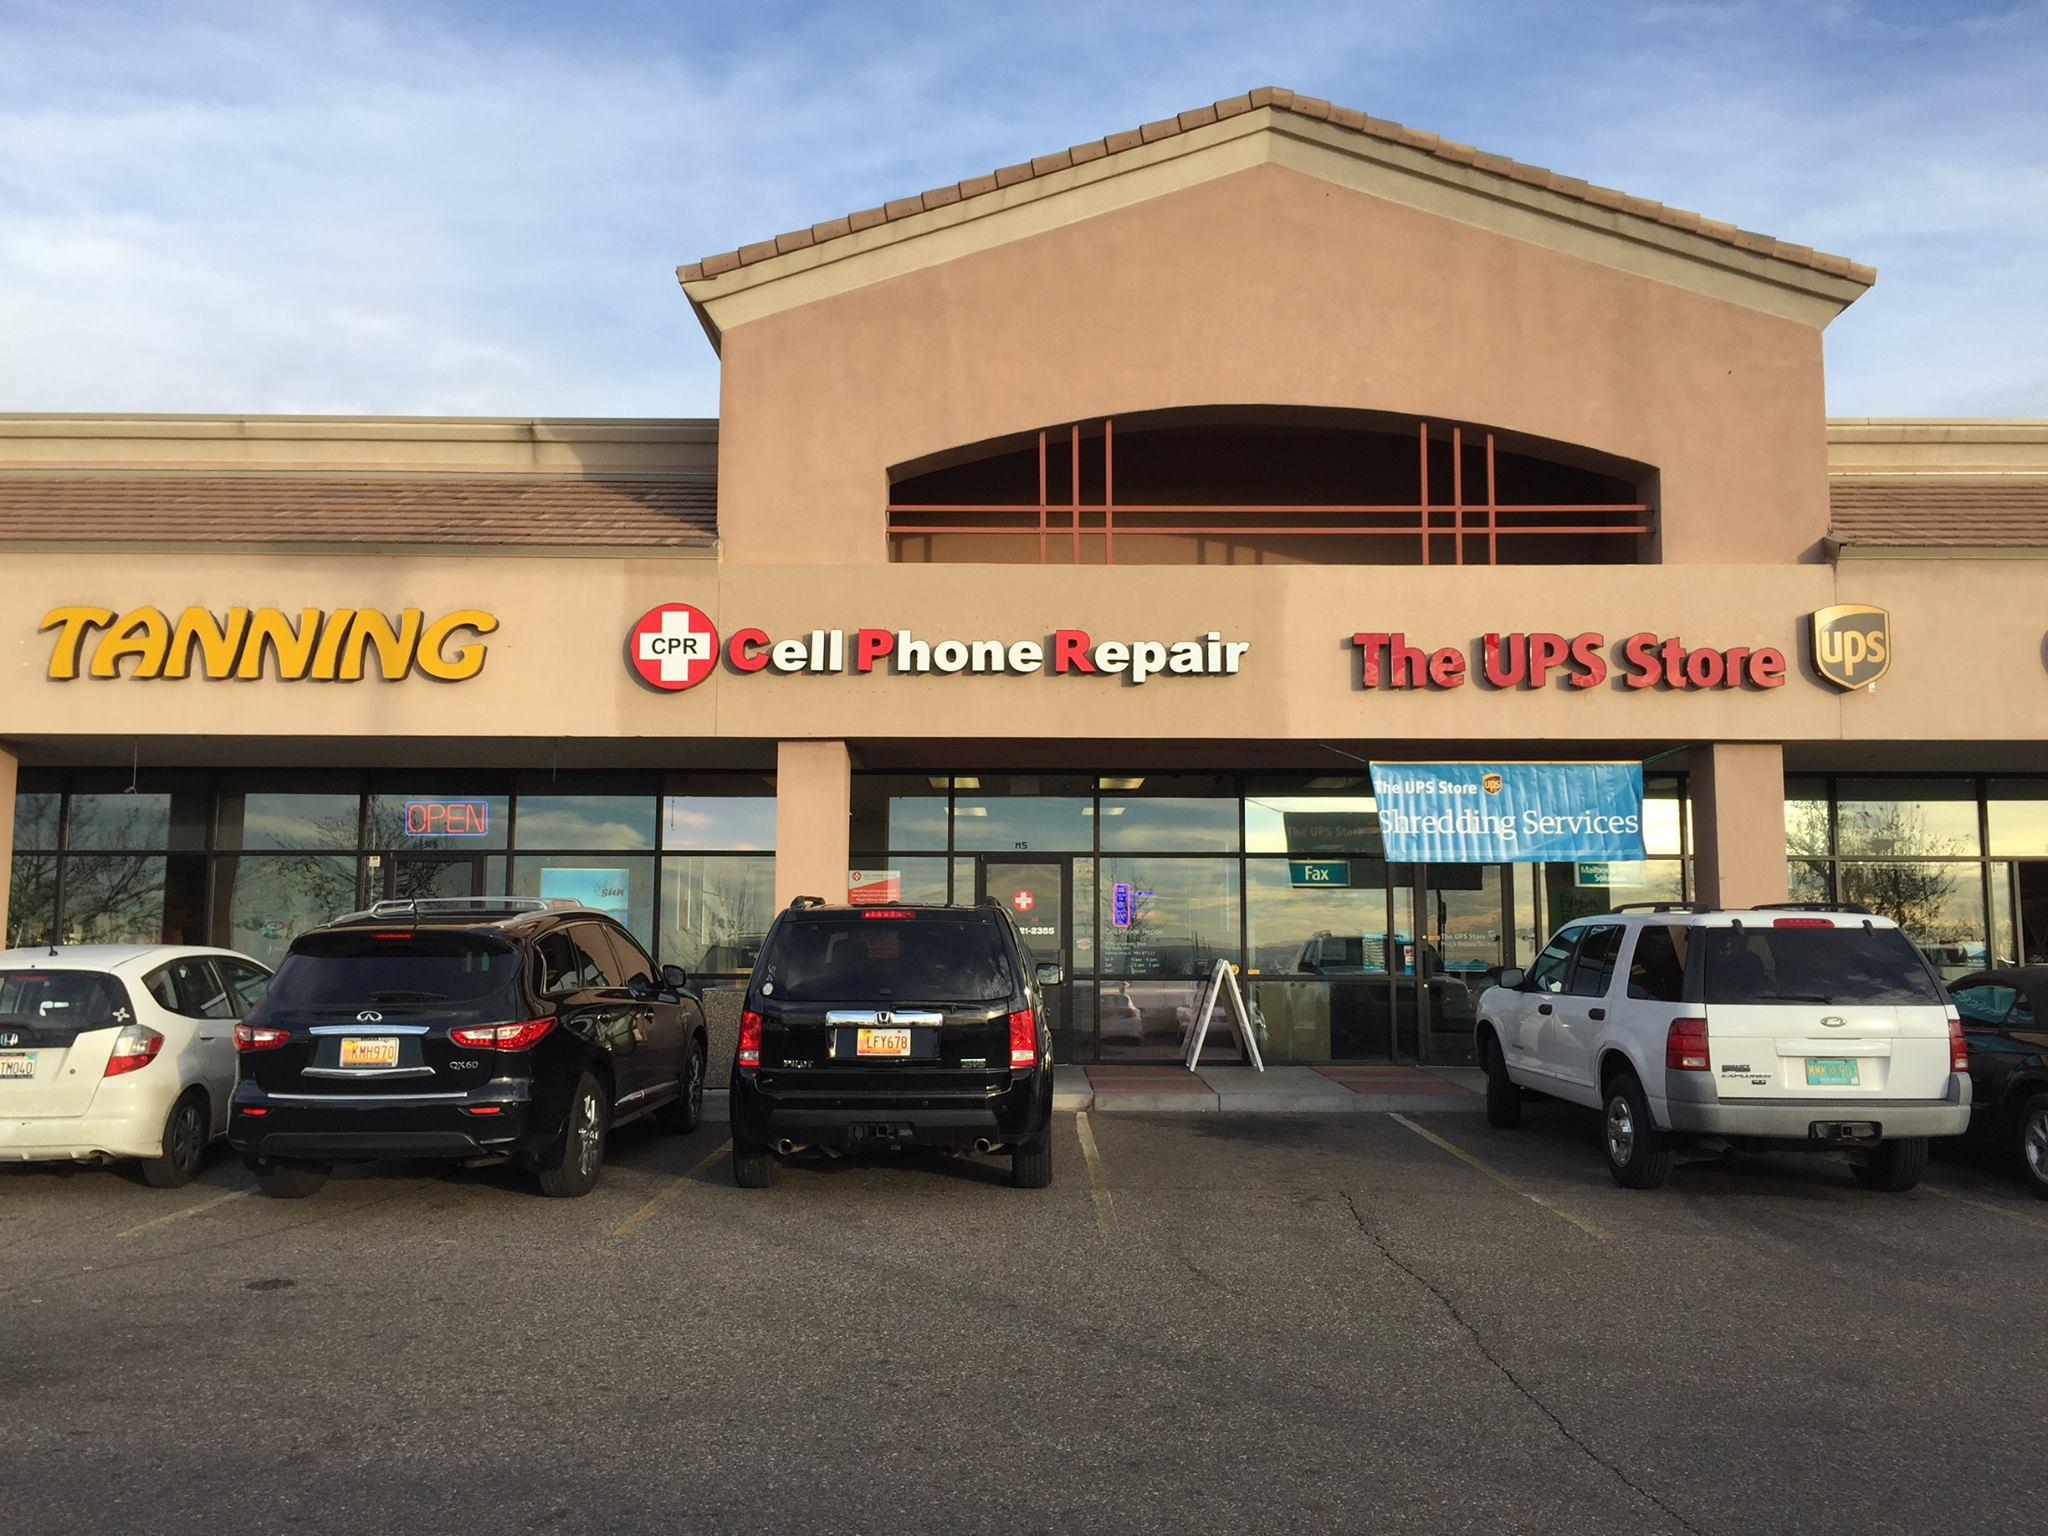 Cell Phone Repair Albuquerque >> Cpr Cell Phone Repair Albuquerque 8100 Wyoming Blvd Ne Albuquerque